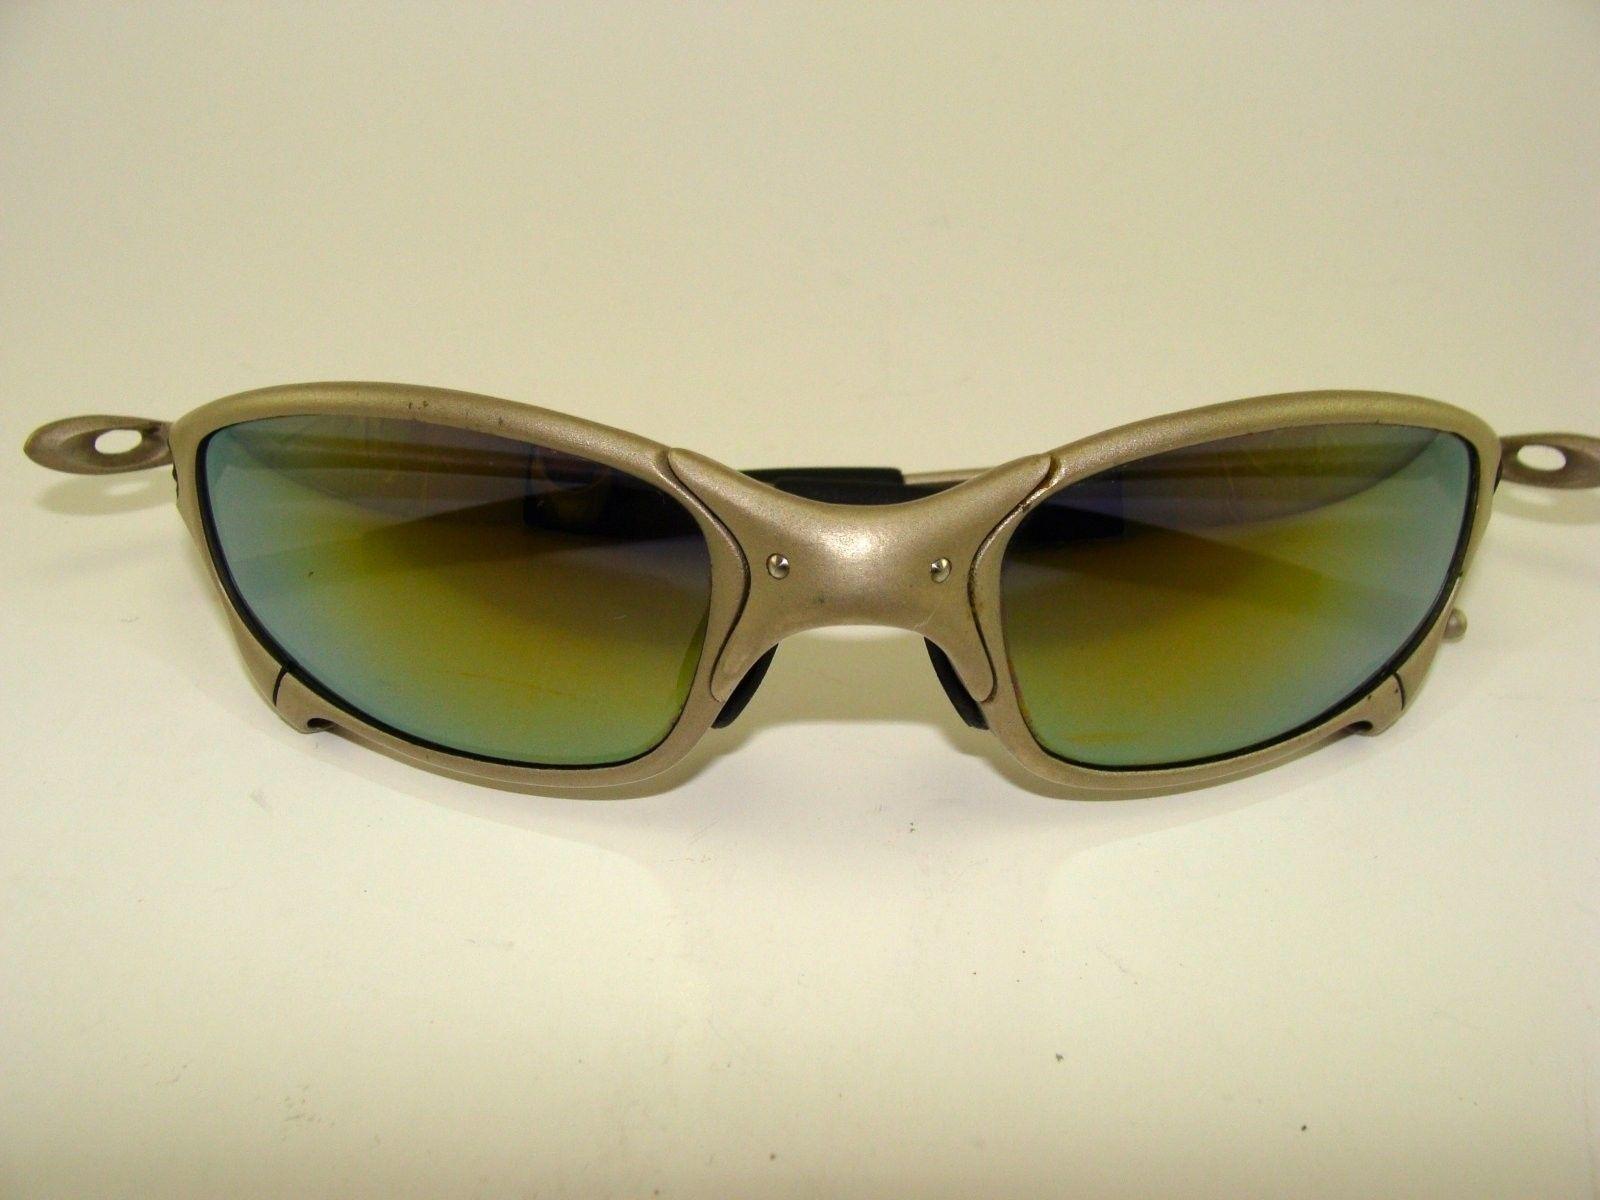 1st Gen Juliet Plasma Emerald 04-115 $400 Shipped CONUS - Oakley Emerald Juliet11.jpg